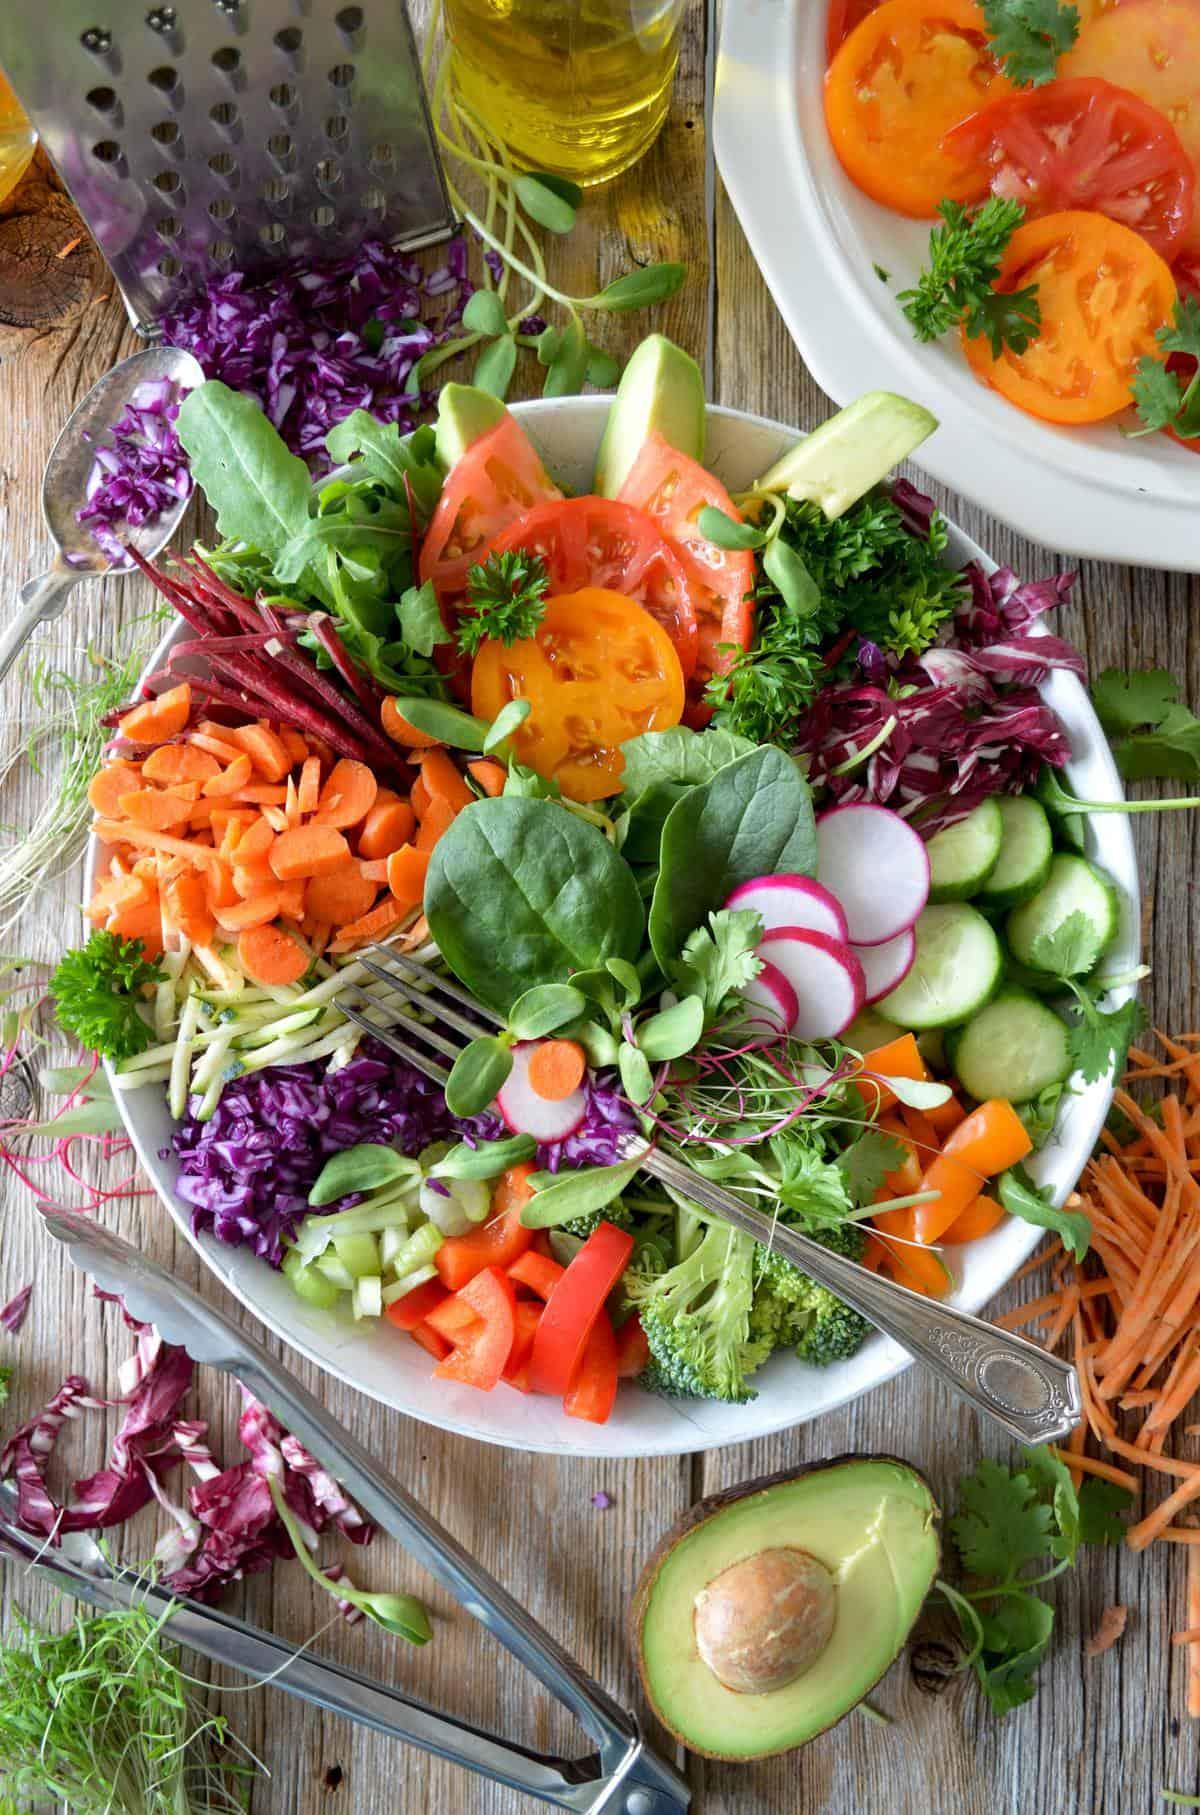 Easy Vidalia Onion Salad Dressing